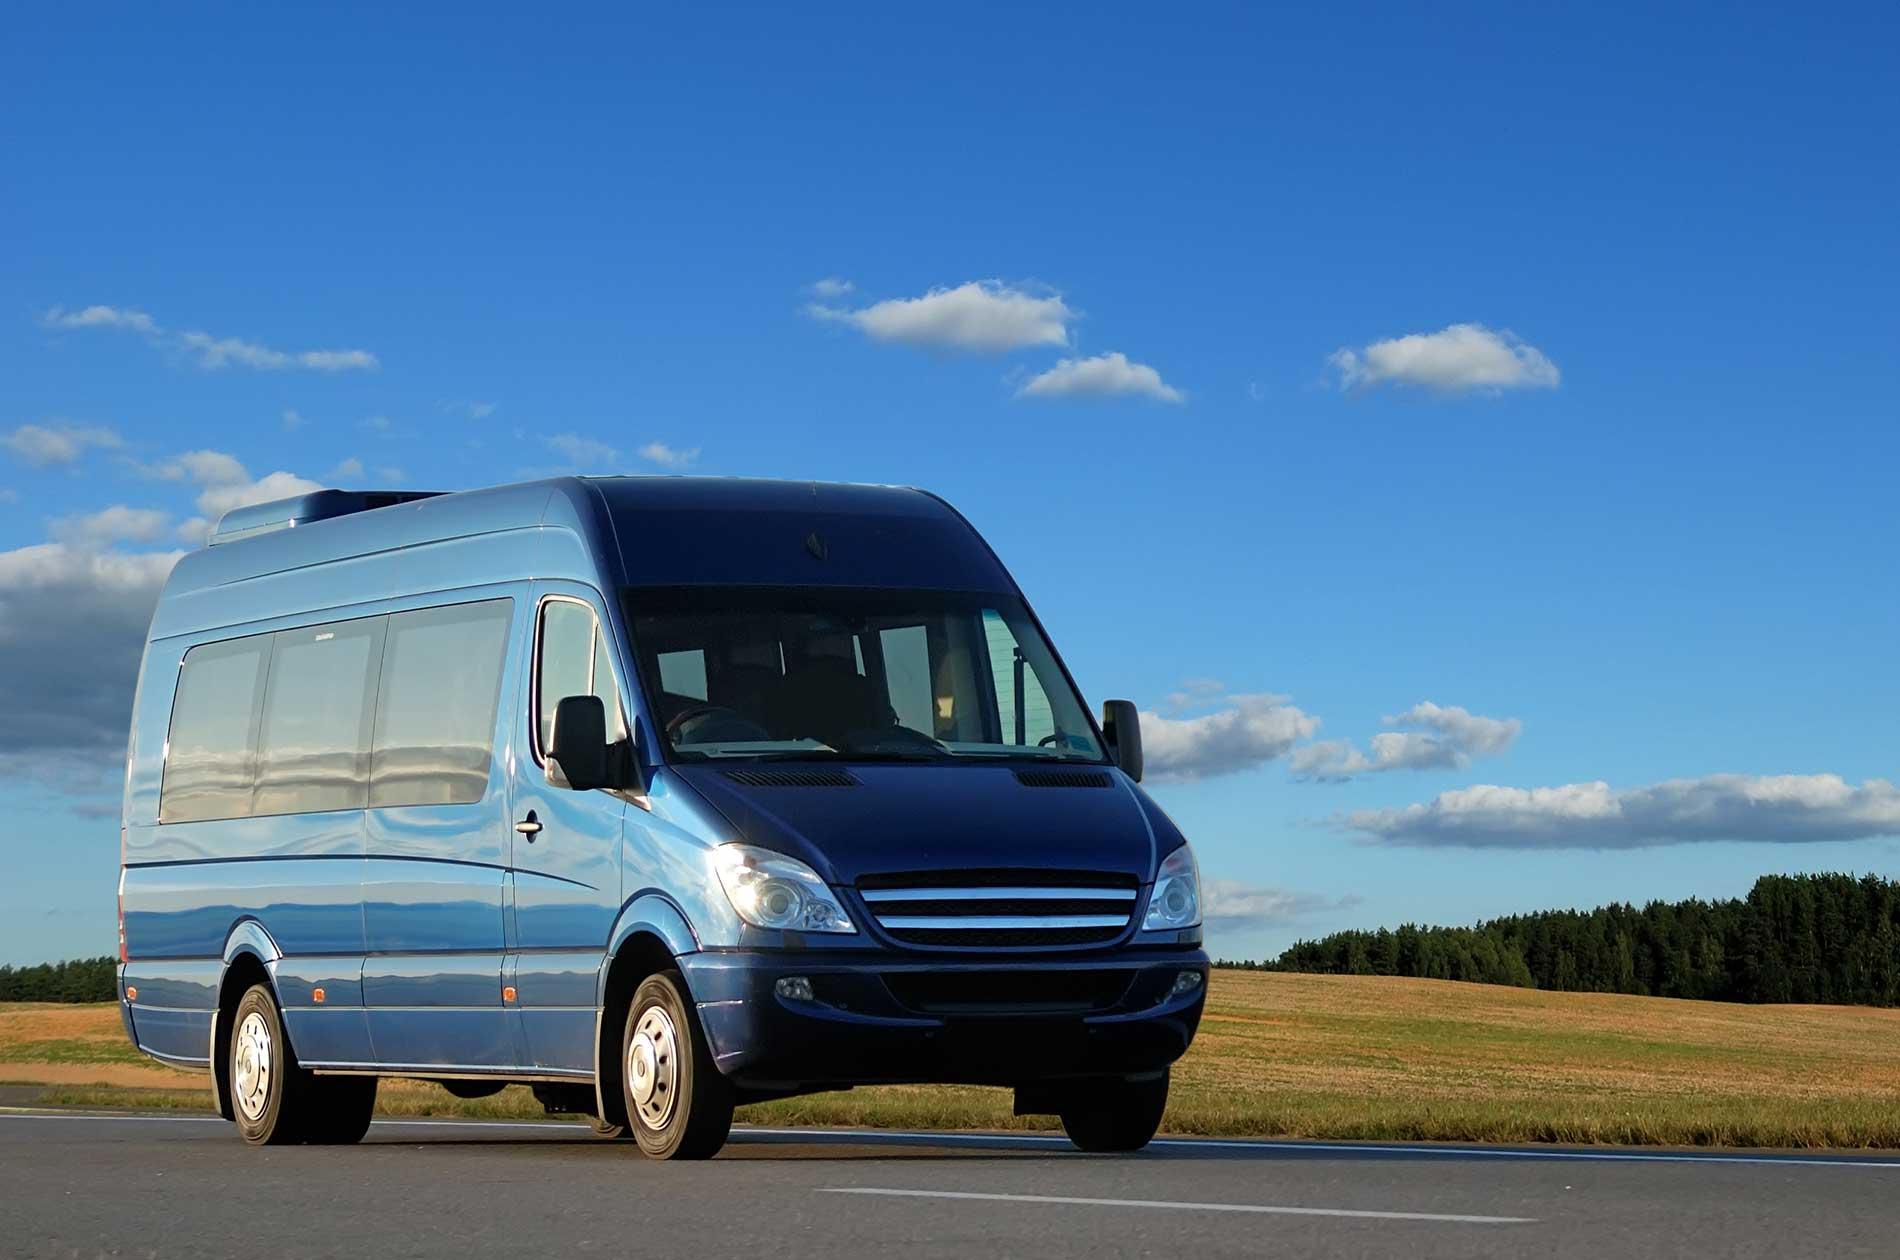 A large passenger van